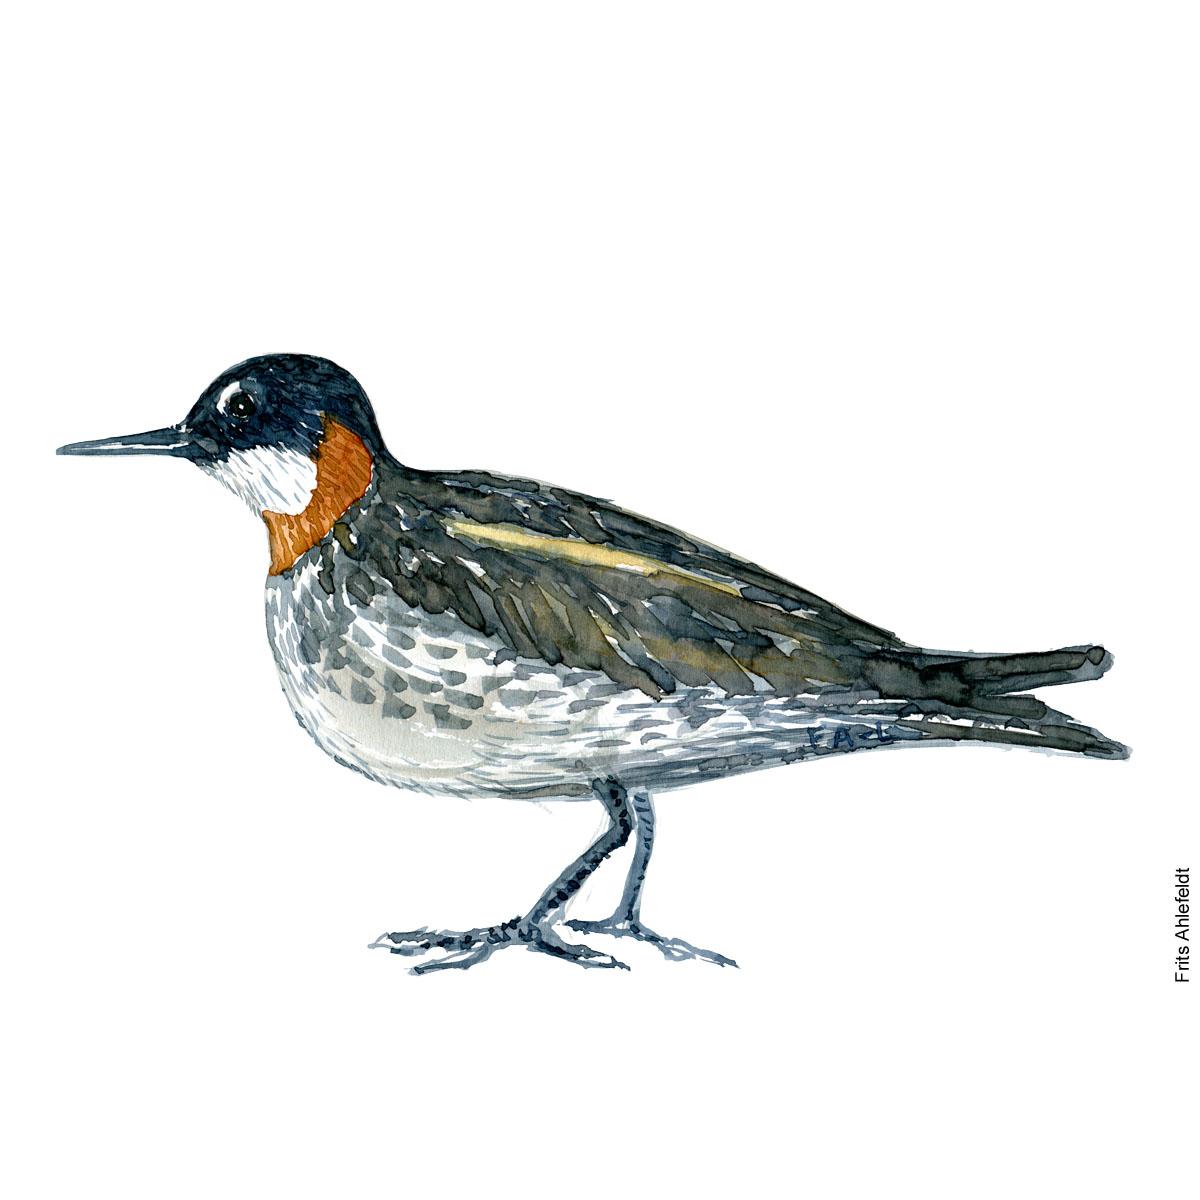 Odinshane - Red necked phalarope bird watercolor painting. Artwork by Frits Ahlefeldt. Fugle akvarel